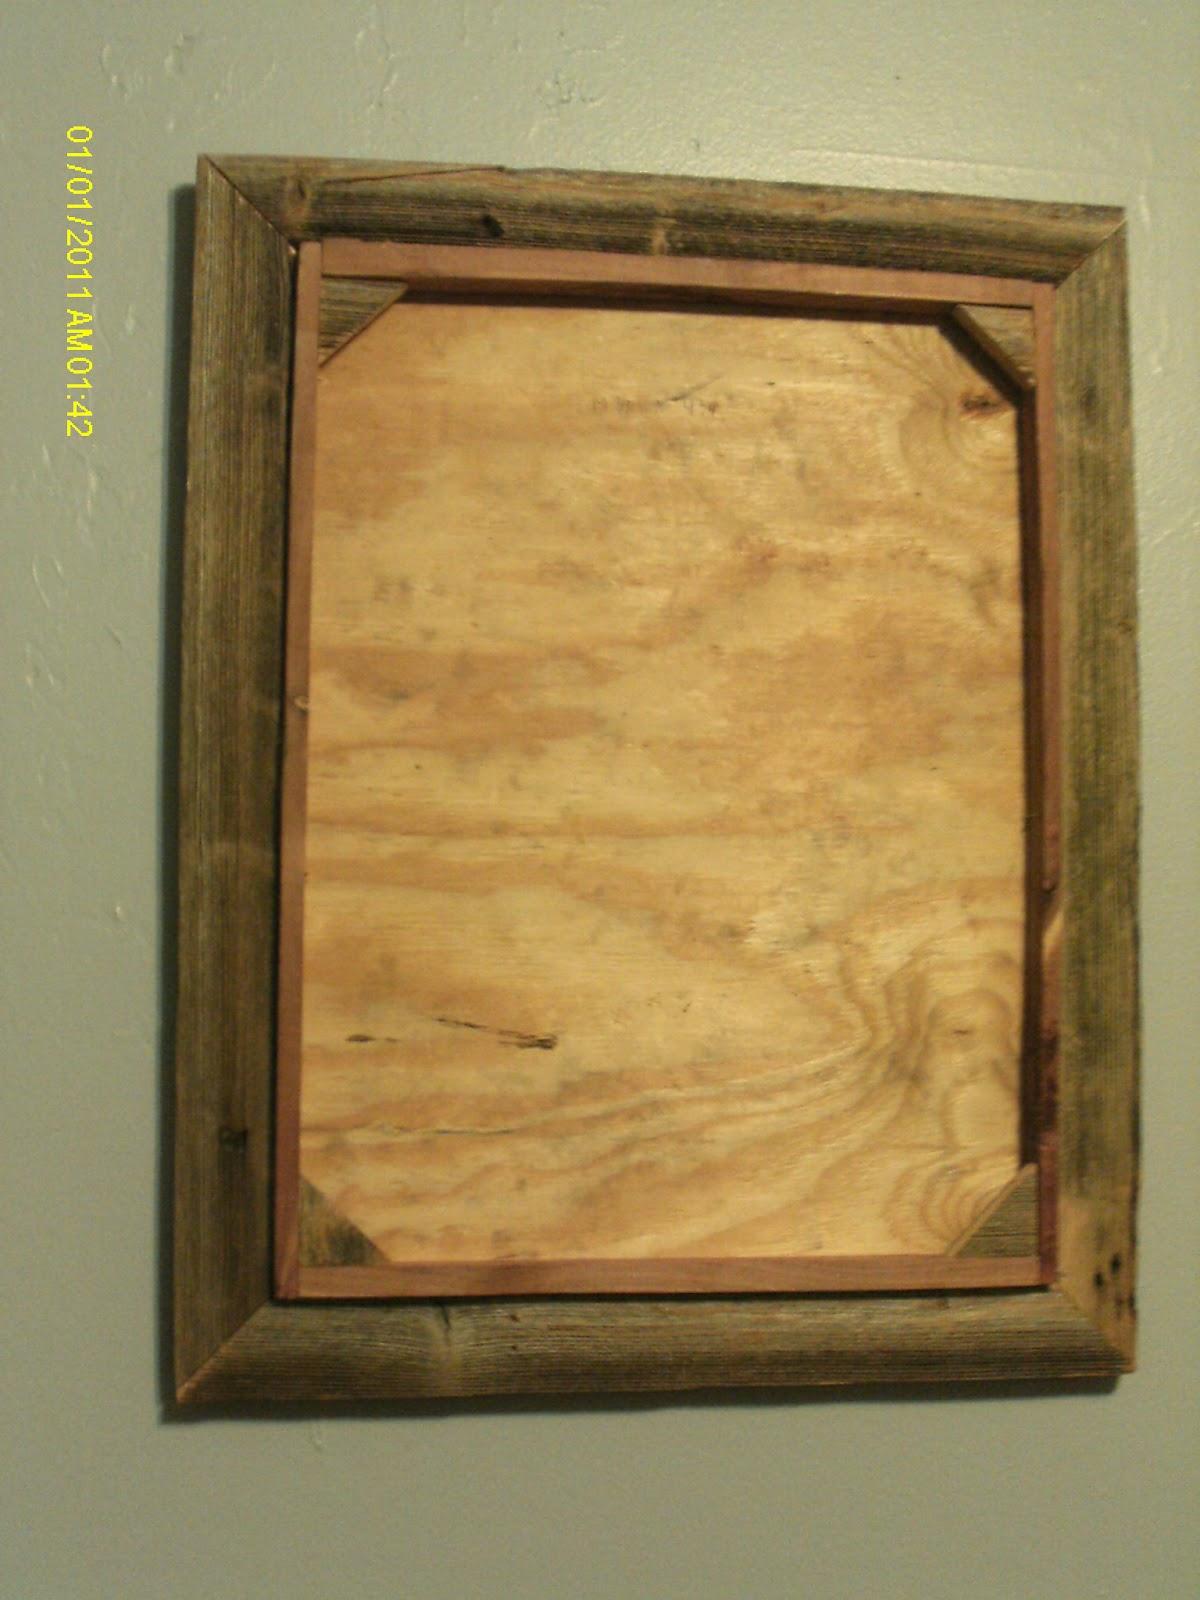 Handmade Rustic & Log Furniture: Barnwood Picture Frames, 2 Pine Bar ...